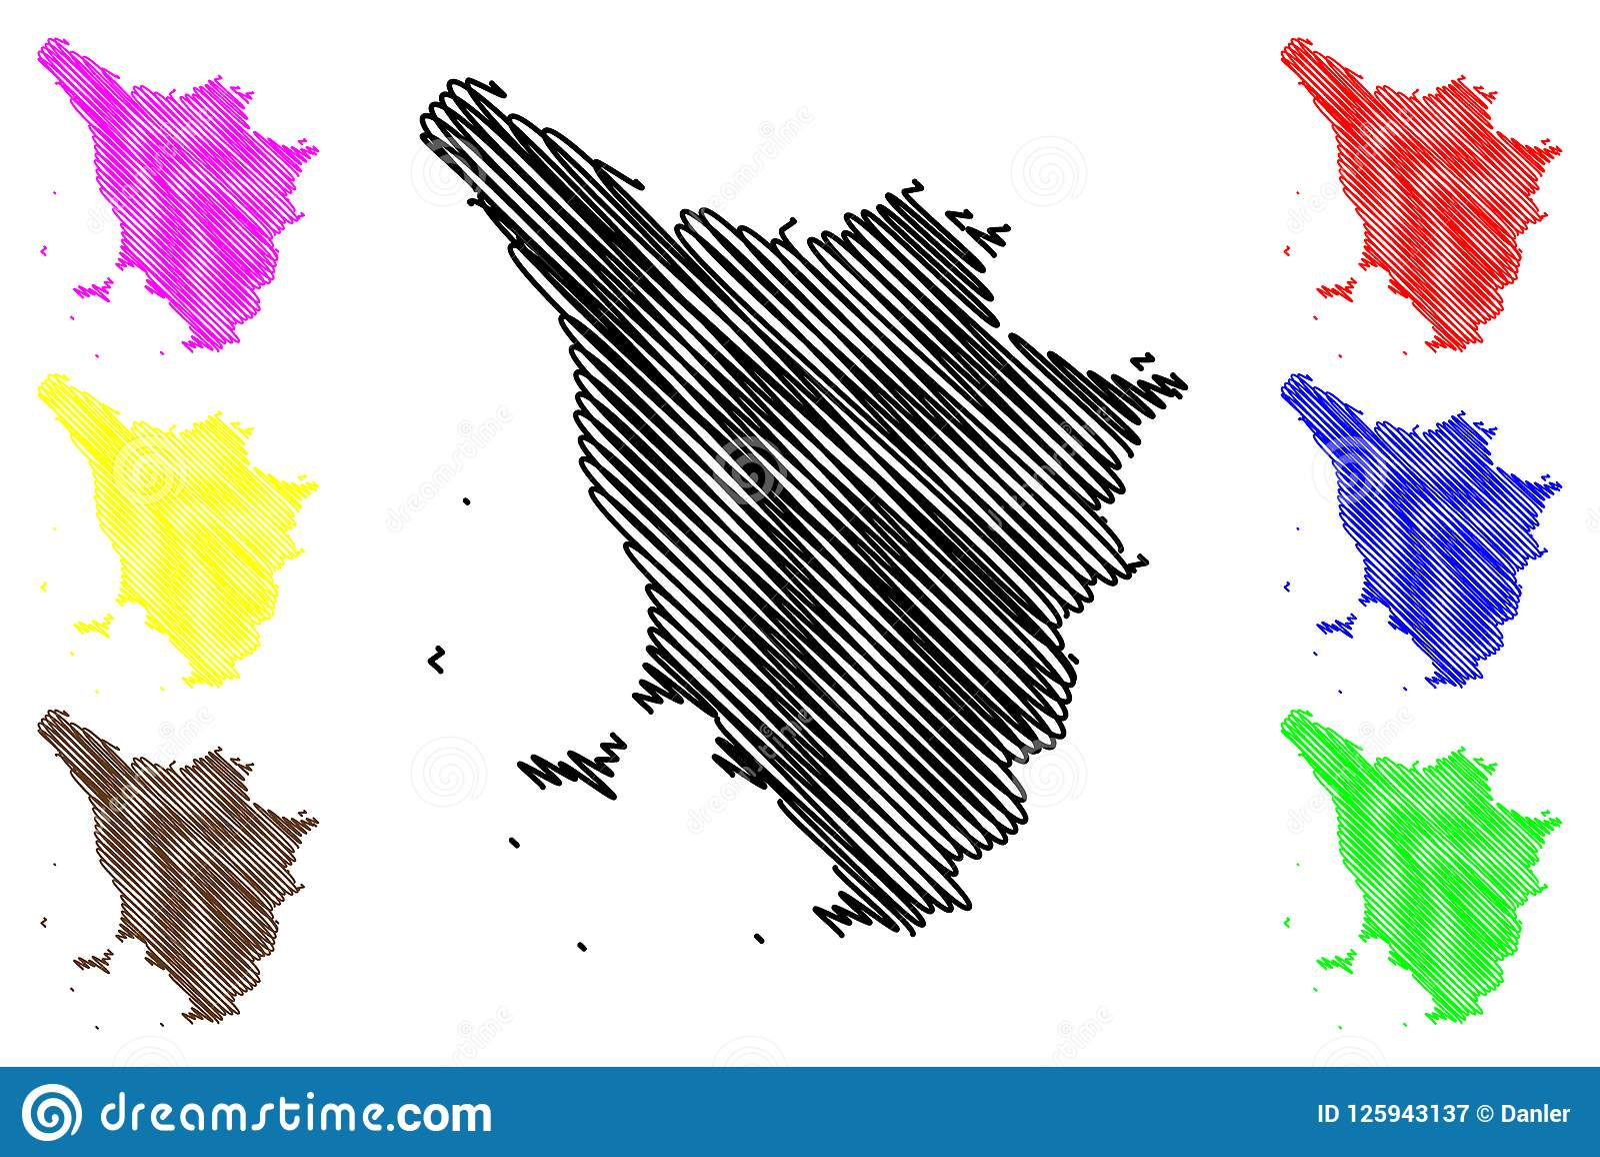 Tuscany Map Of Italy.Tuscany Map Vector Stock Vector Illustration Of Flat 125943137